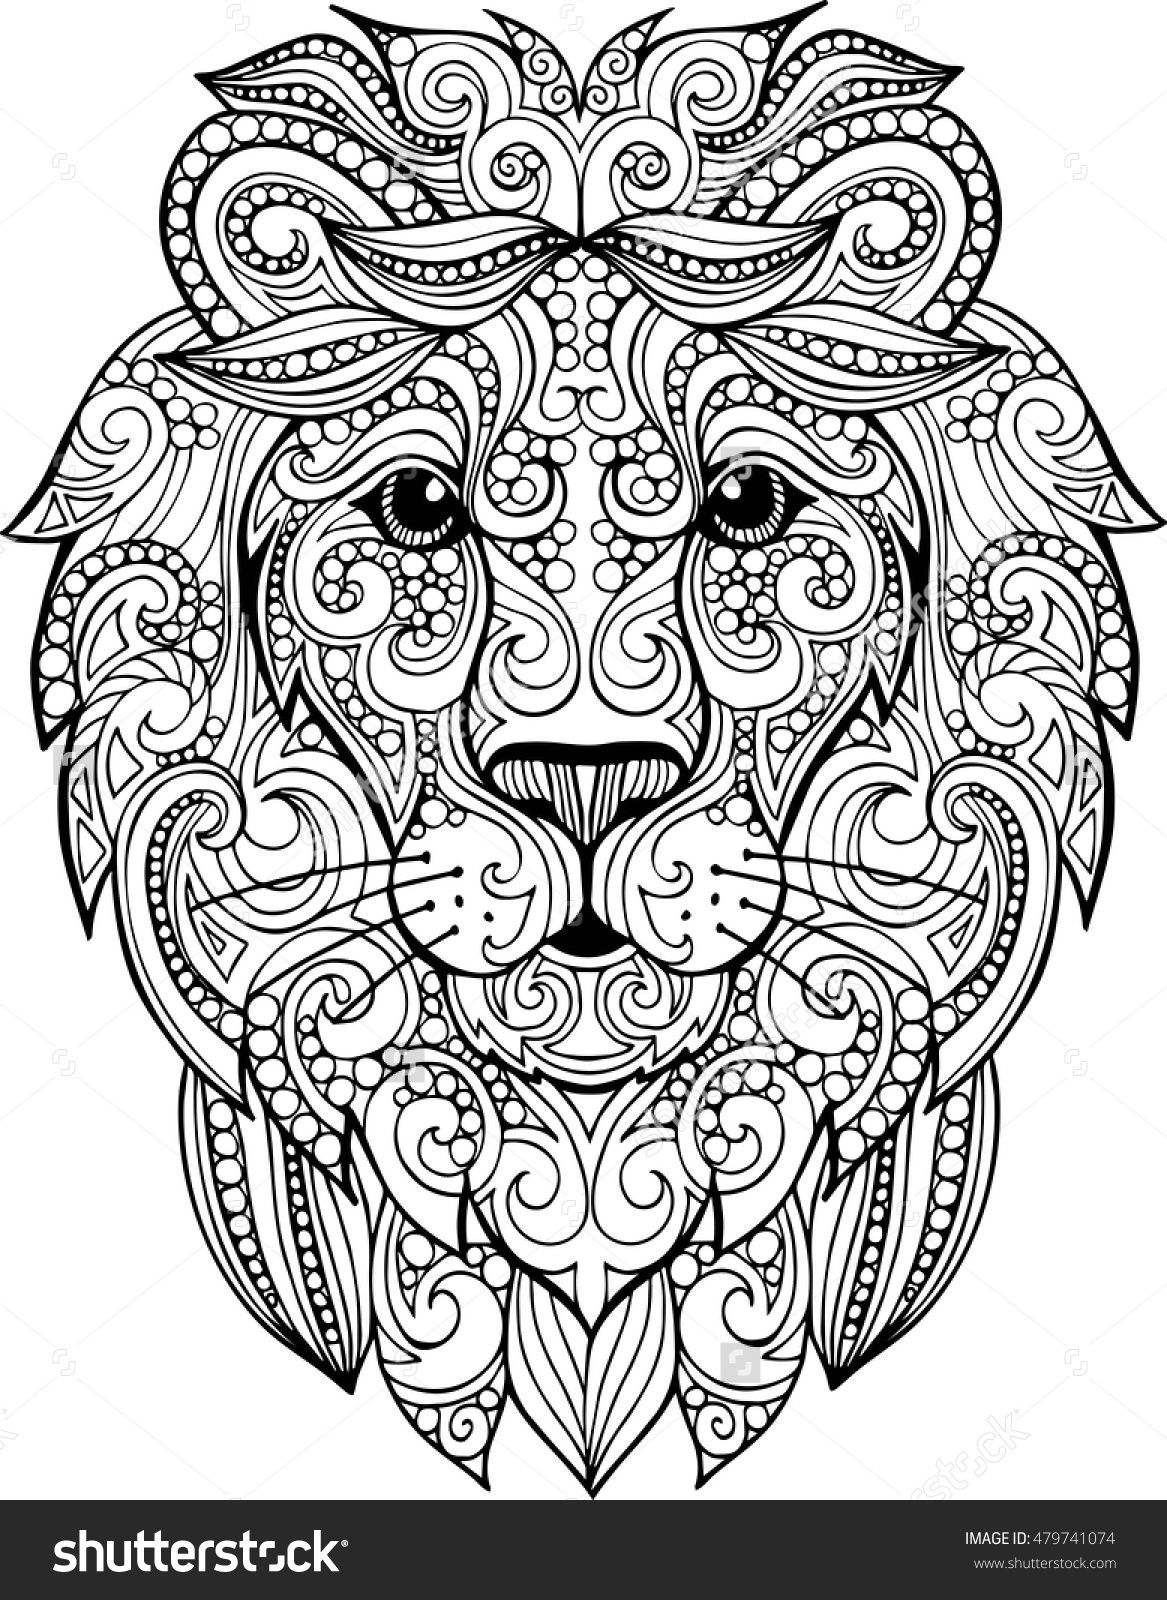 1167x1600 Hand Drawn Doodle Zentangle Lion Illustration. Decorative Ornate